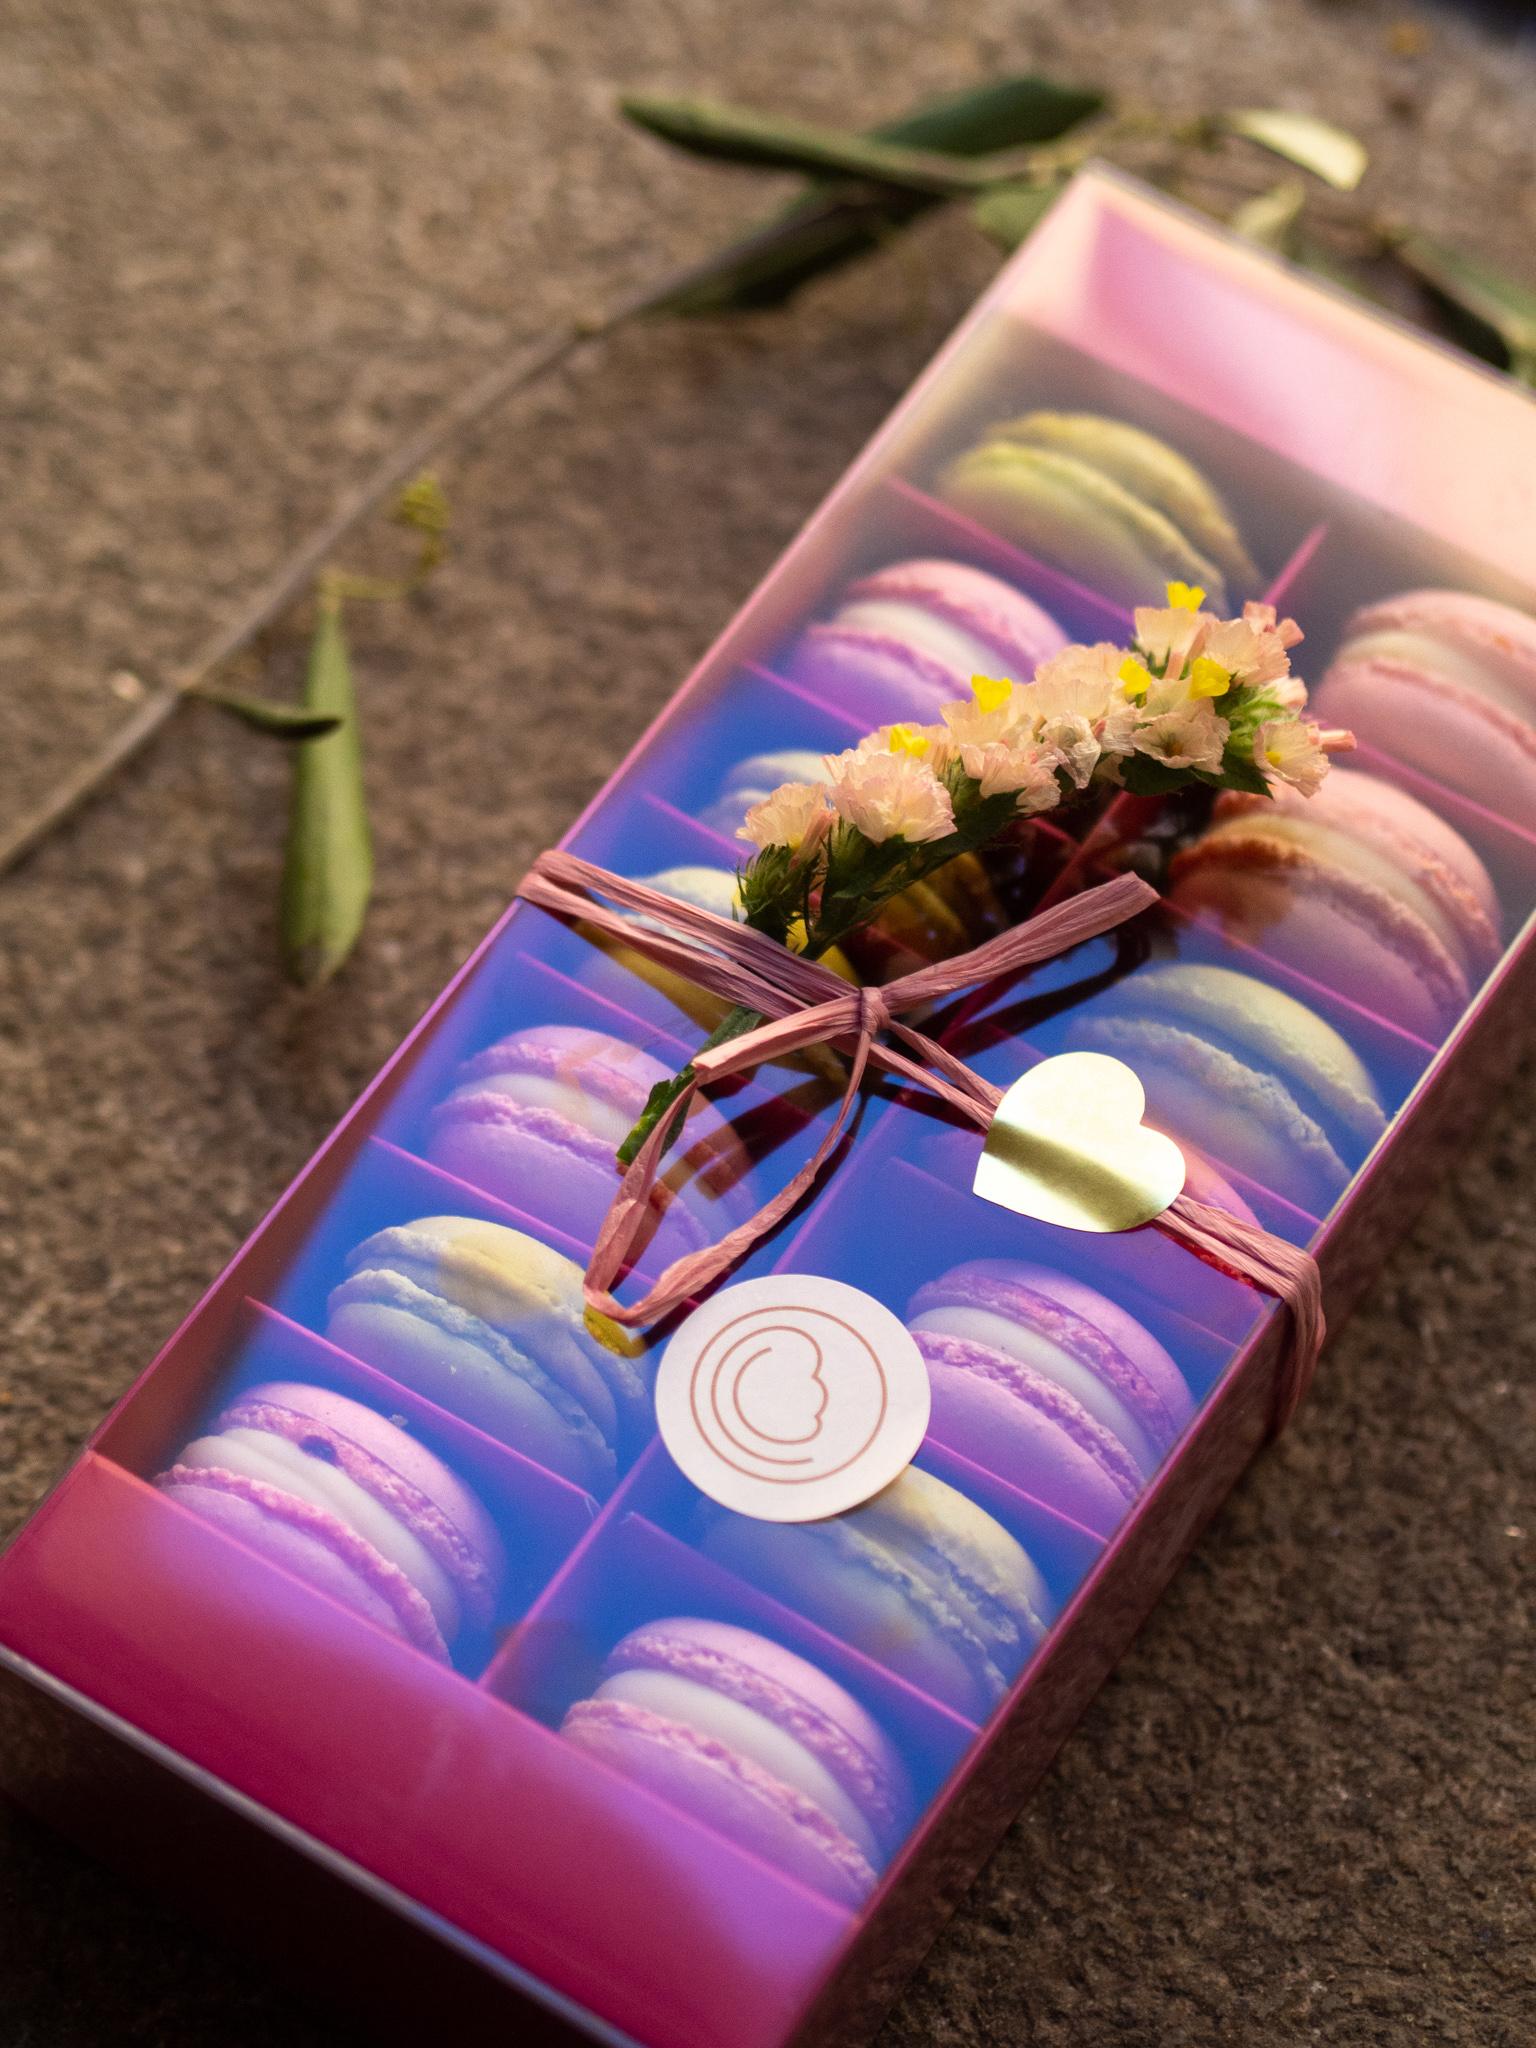 14 er Macaron Geschenk Box